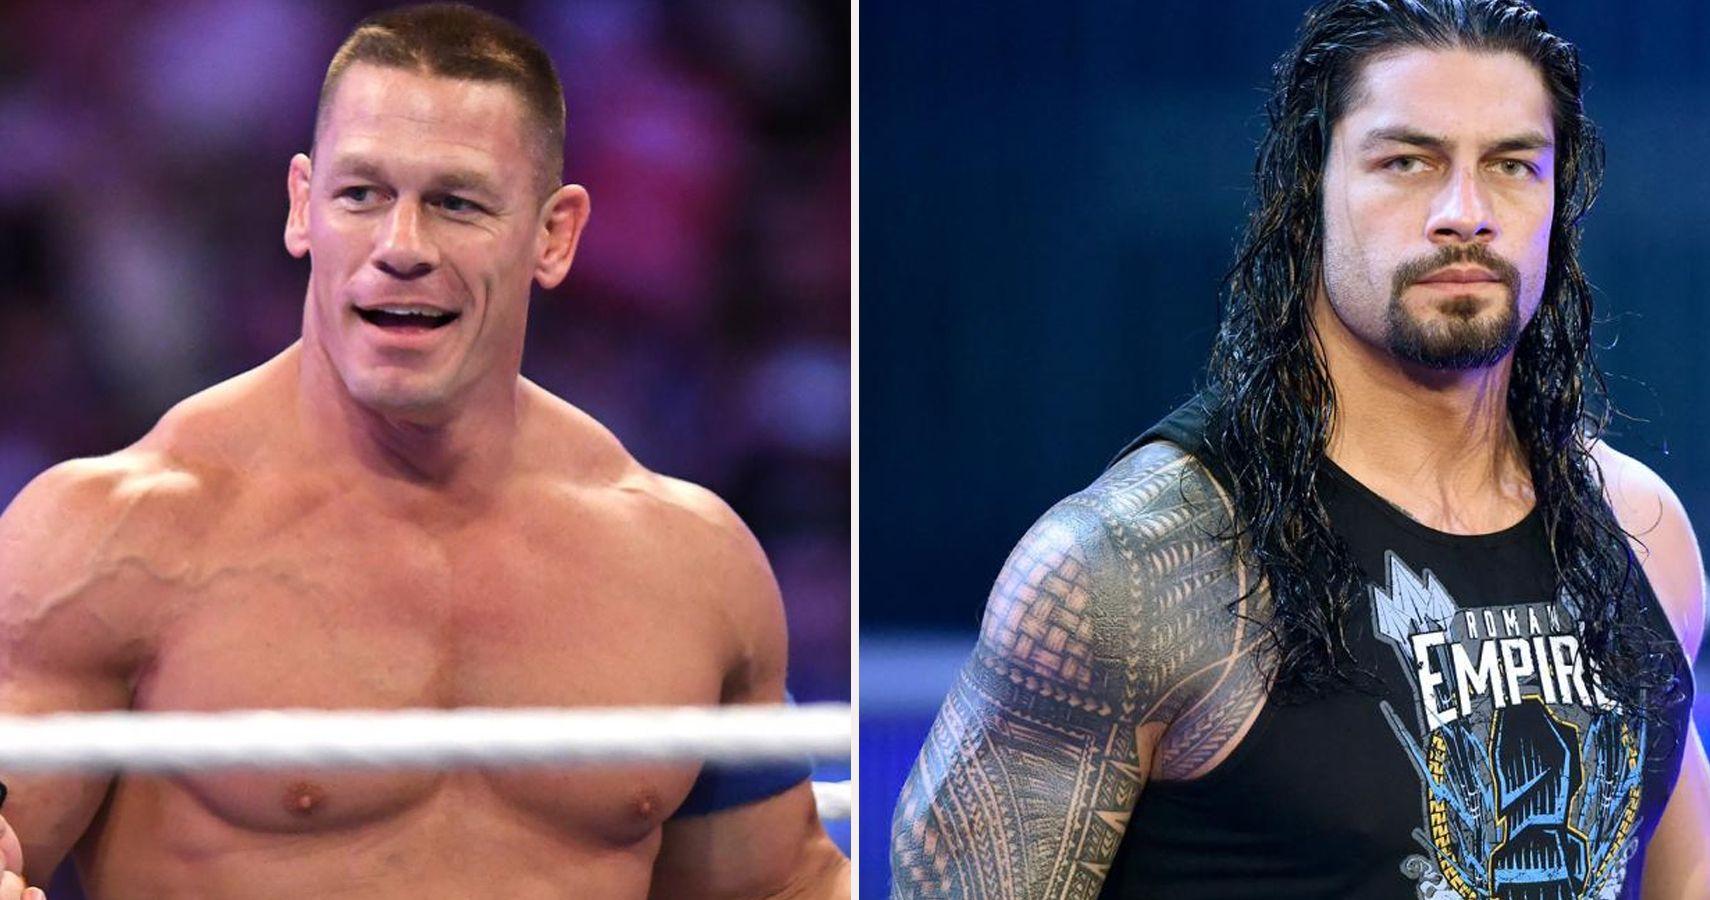 John-Cena-Roman-Reigns.jpg